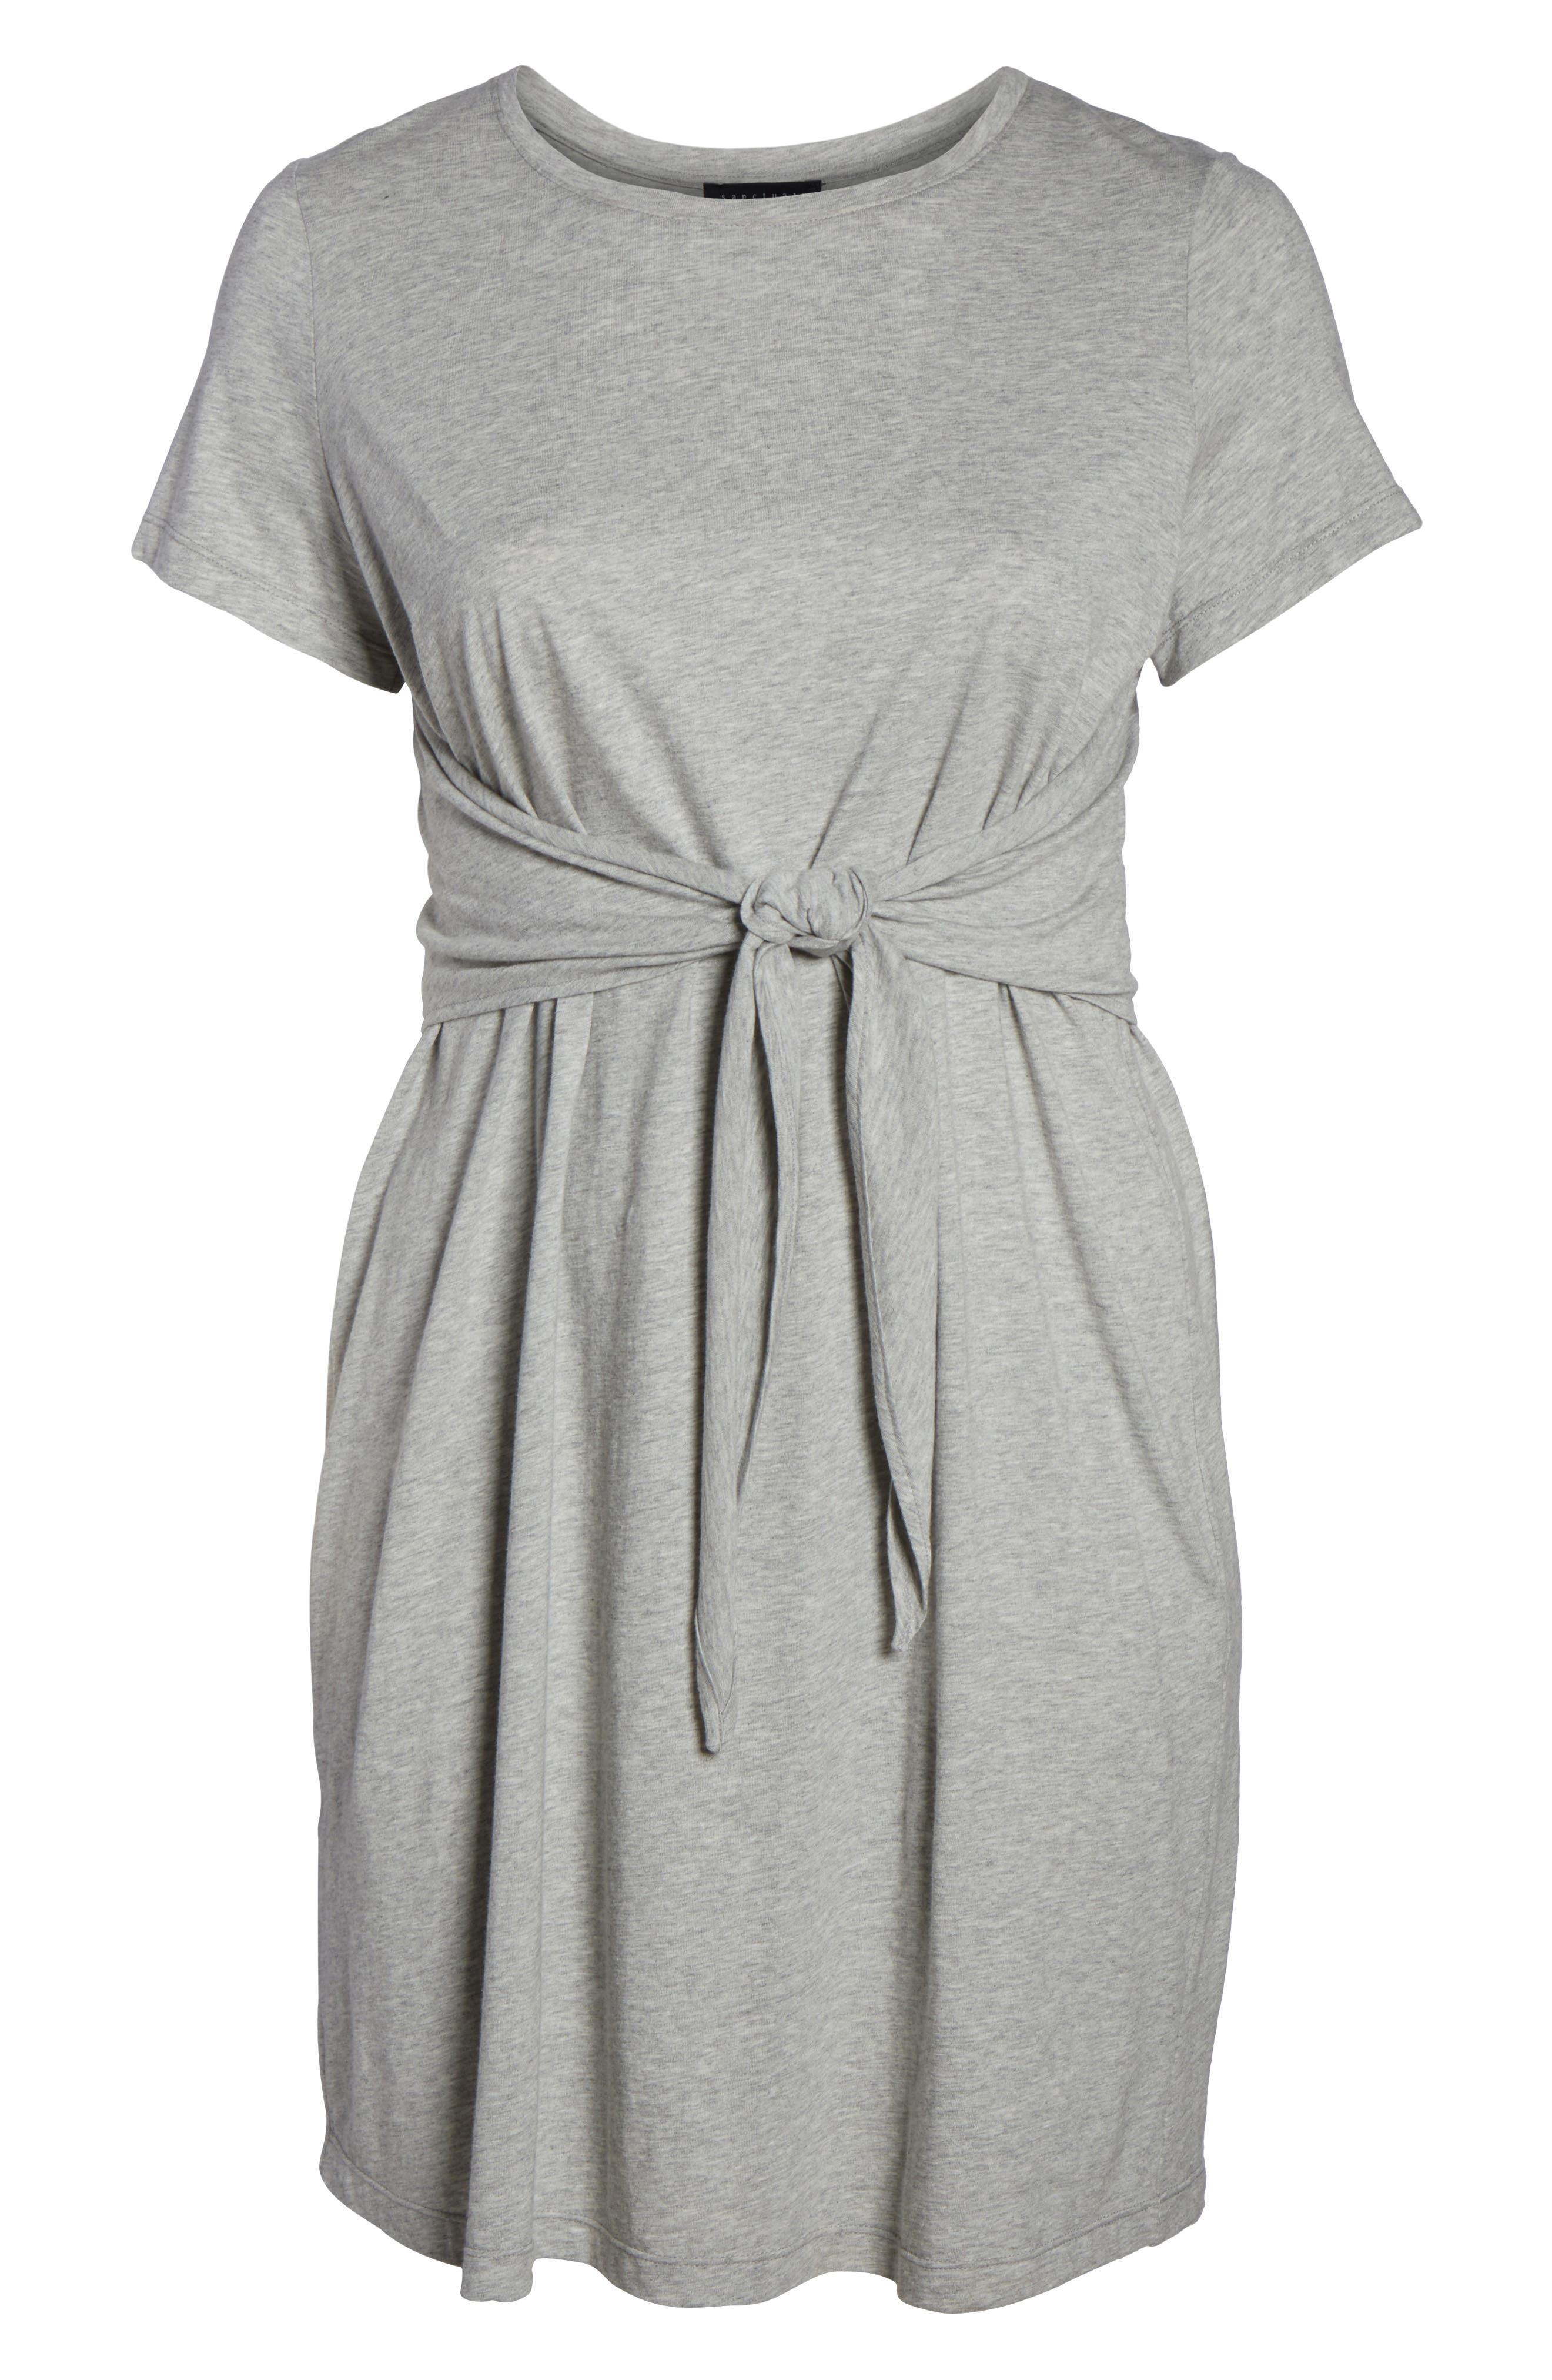 Juno Tie Waist T-Shirt Dress,                             Alternate thumbnail 6, color,                             Heather Grey